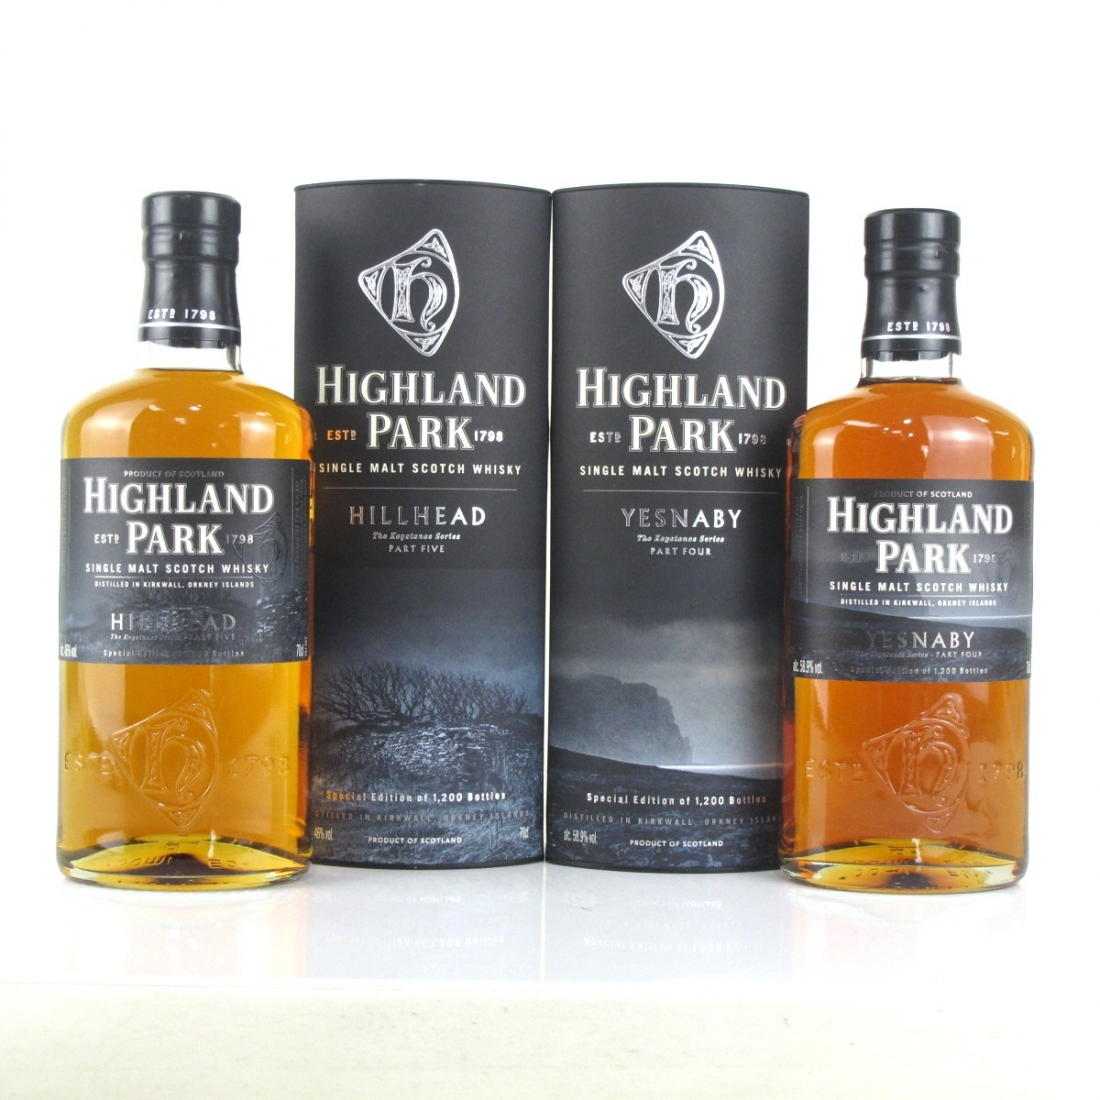 Highland Park Keystones Series 2 x 70cl / Yesnaby and Hillhead